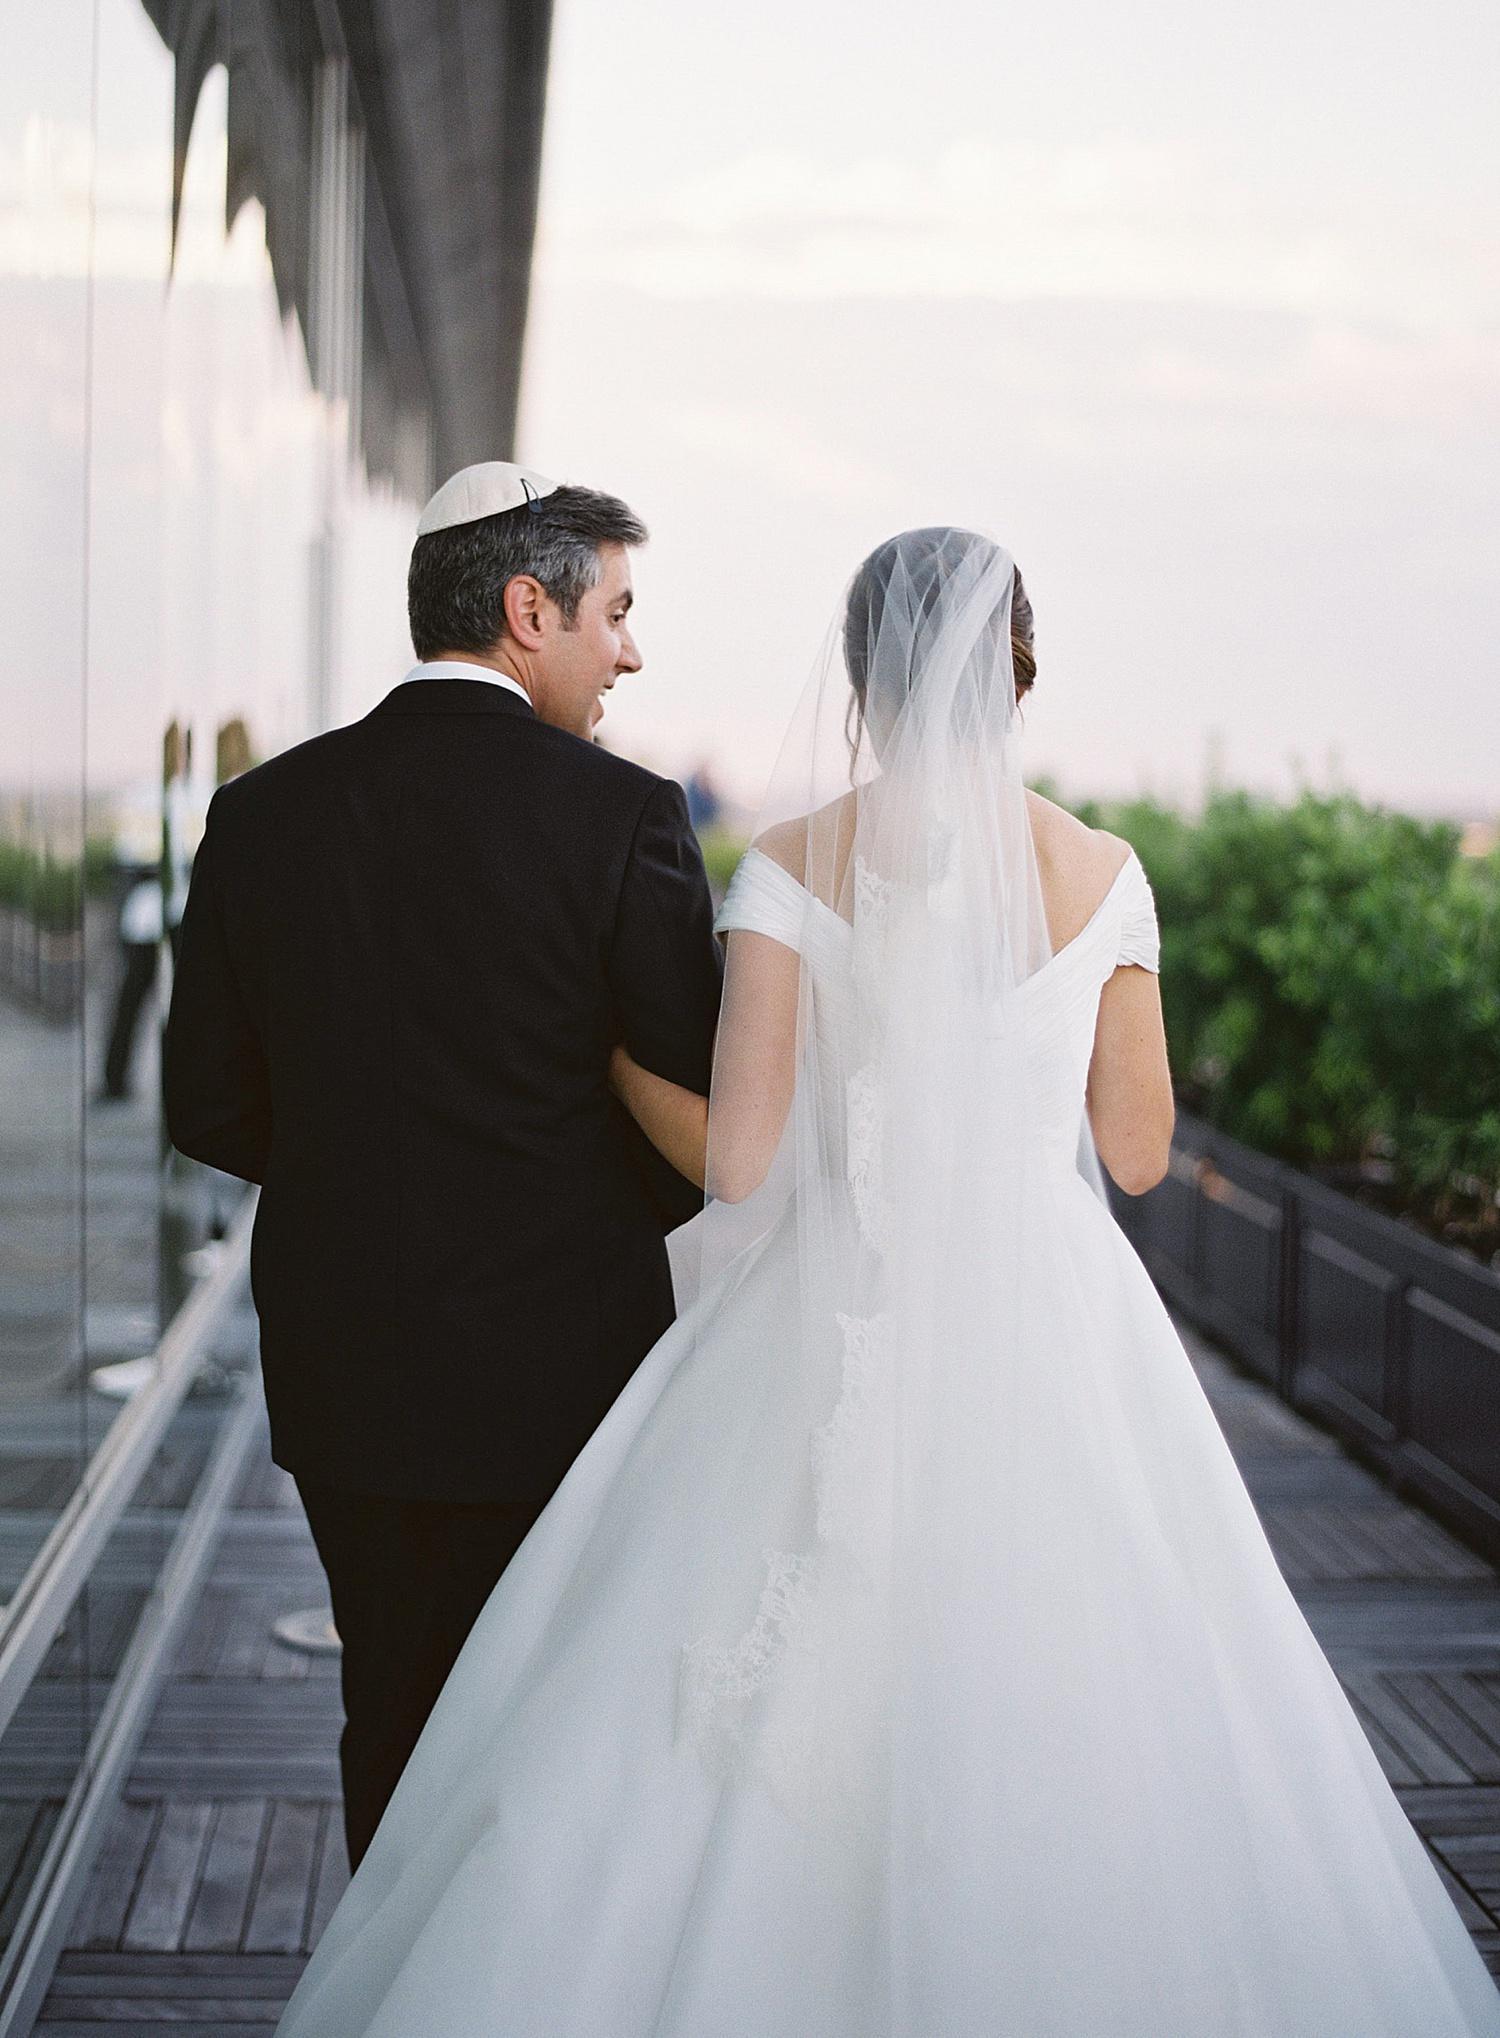 16_dewberry_charleston_wedding.jpg